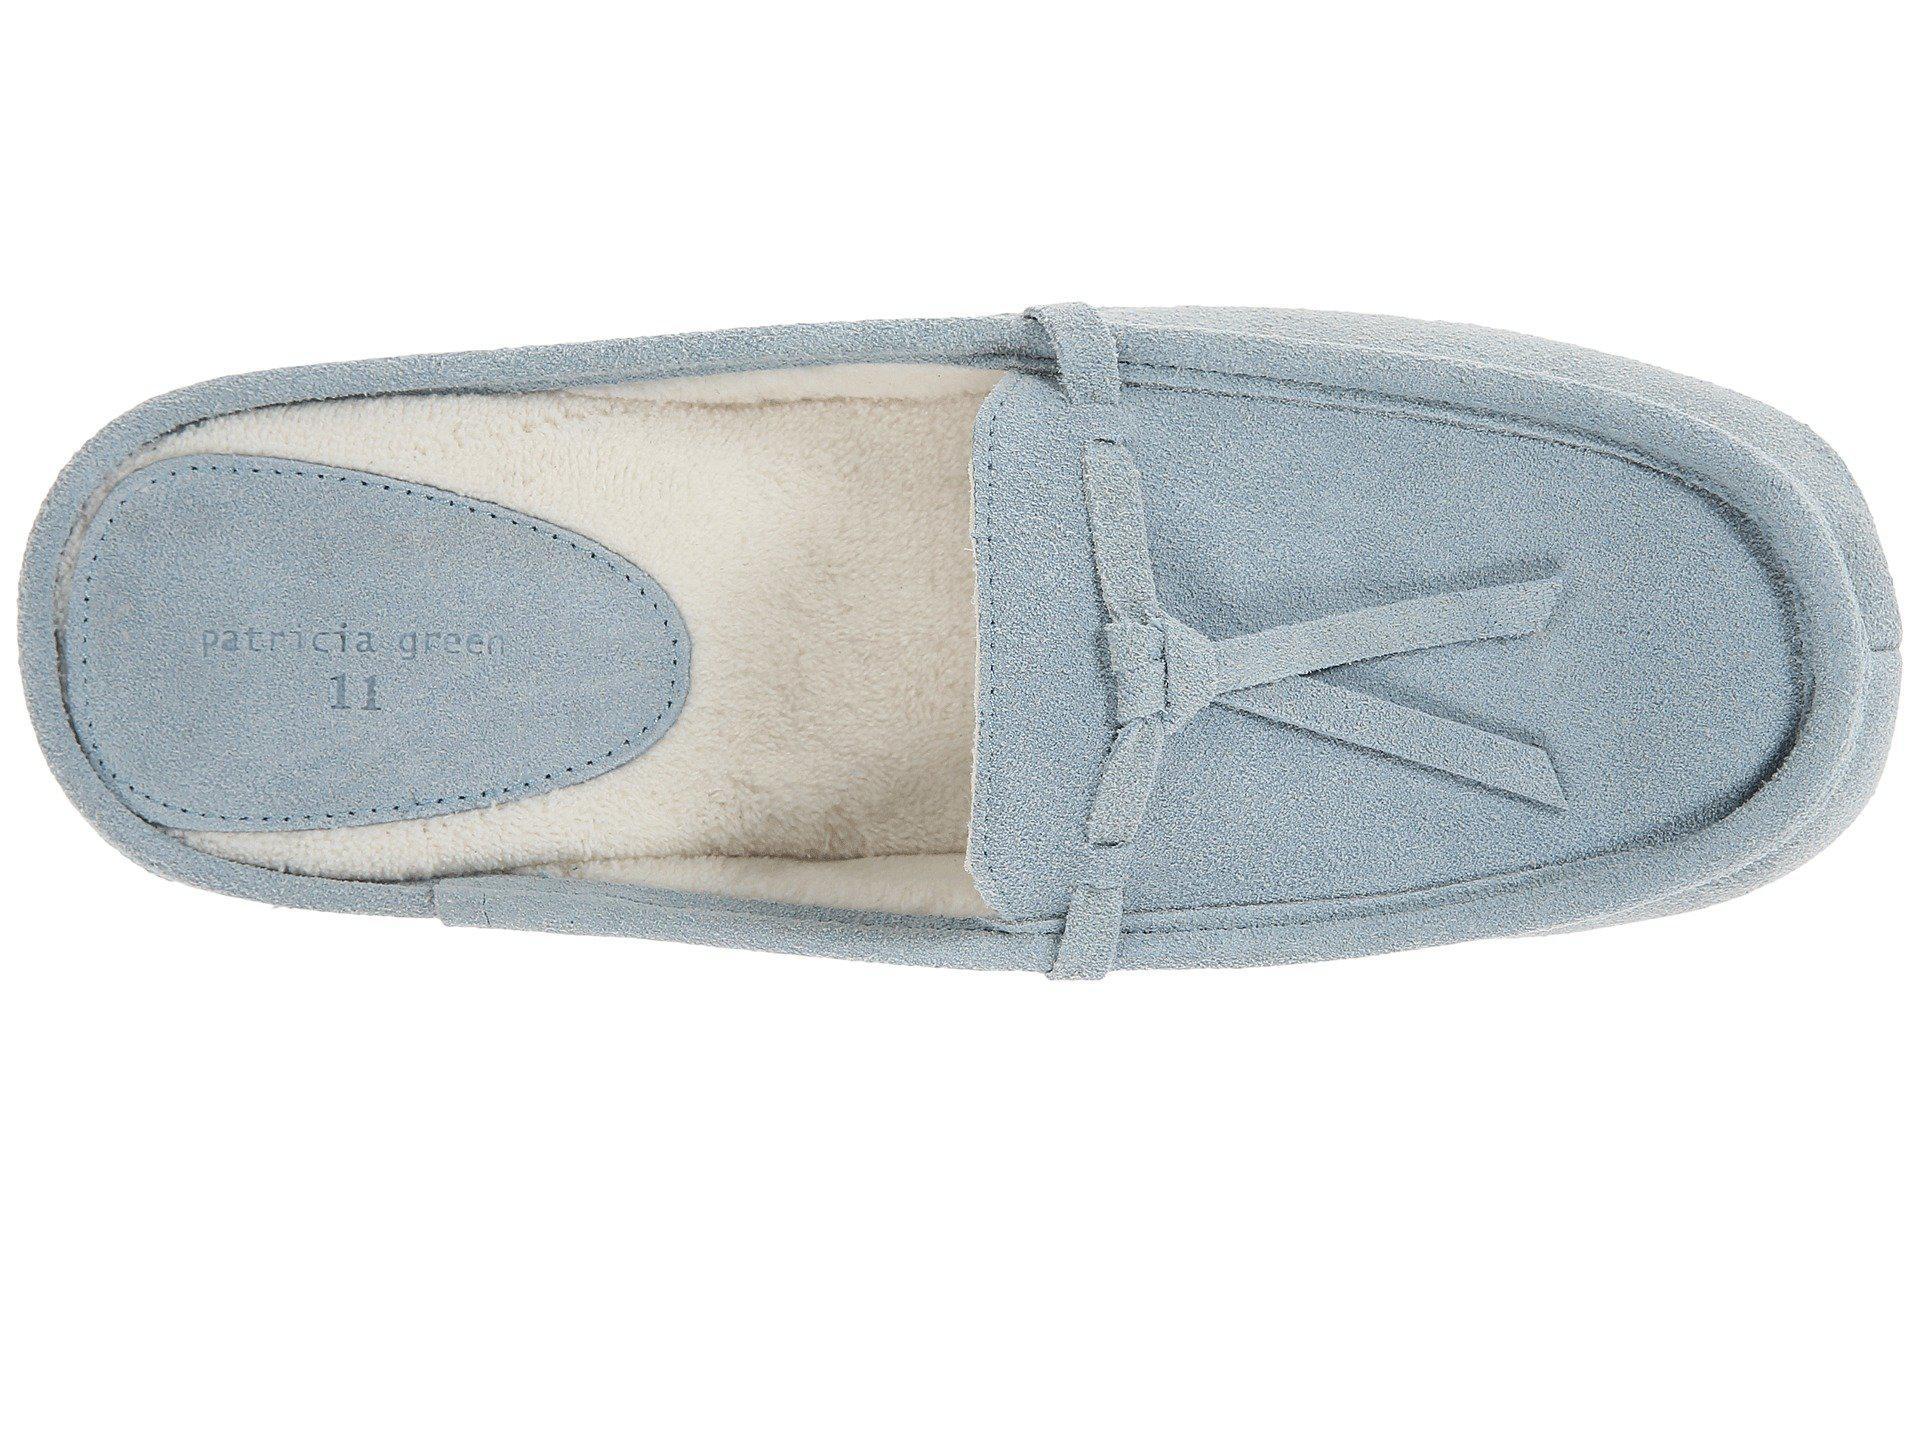 686ca77bf2b3 Patricia Green - Greenwich (light Blue Suede) Women s Slippers - Lyst. View  fullscreen